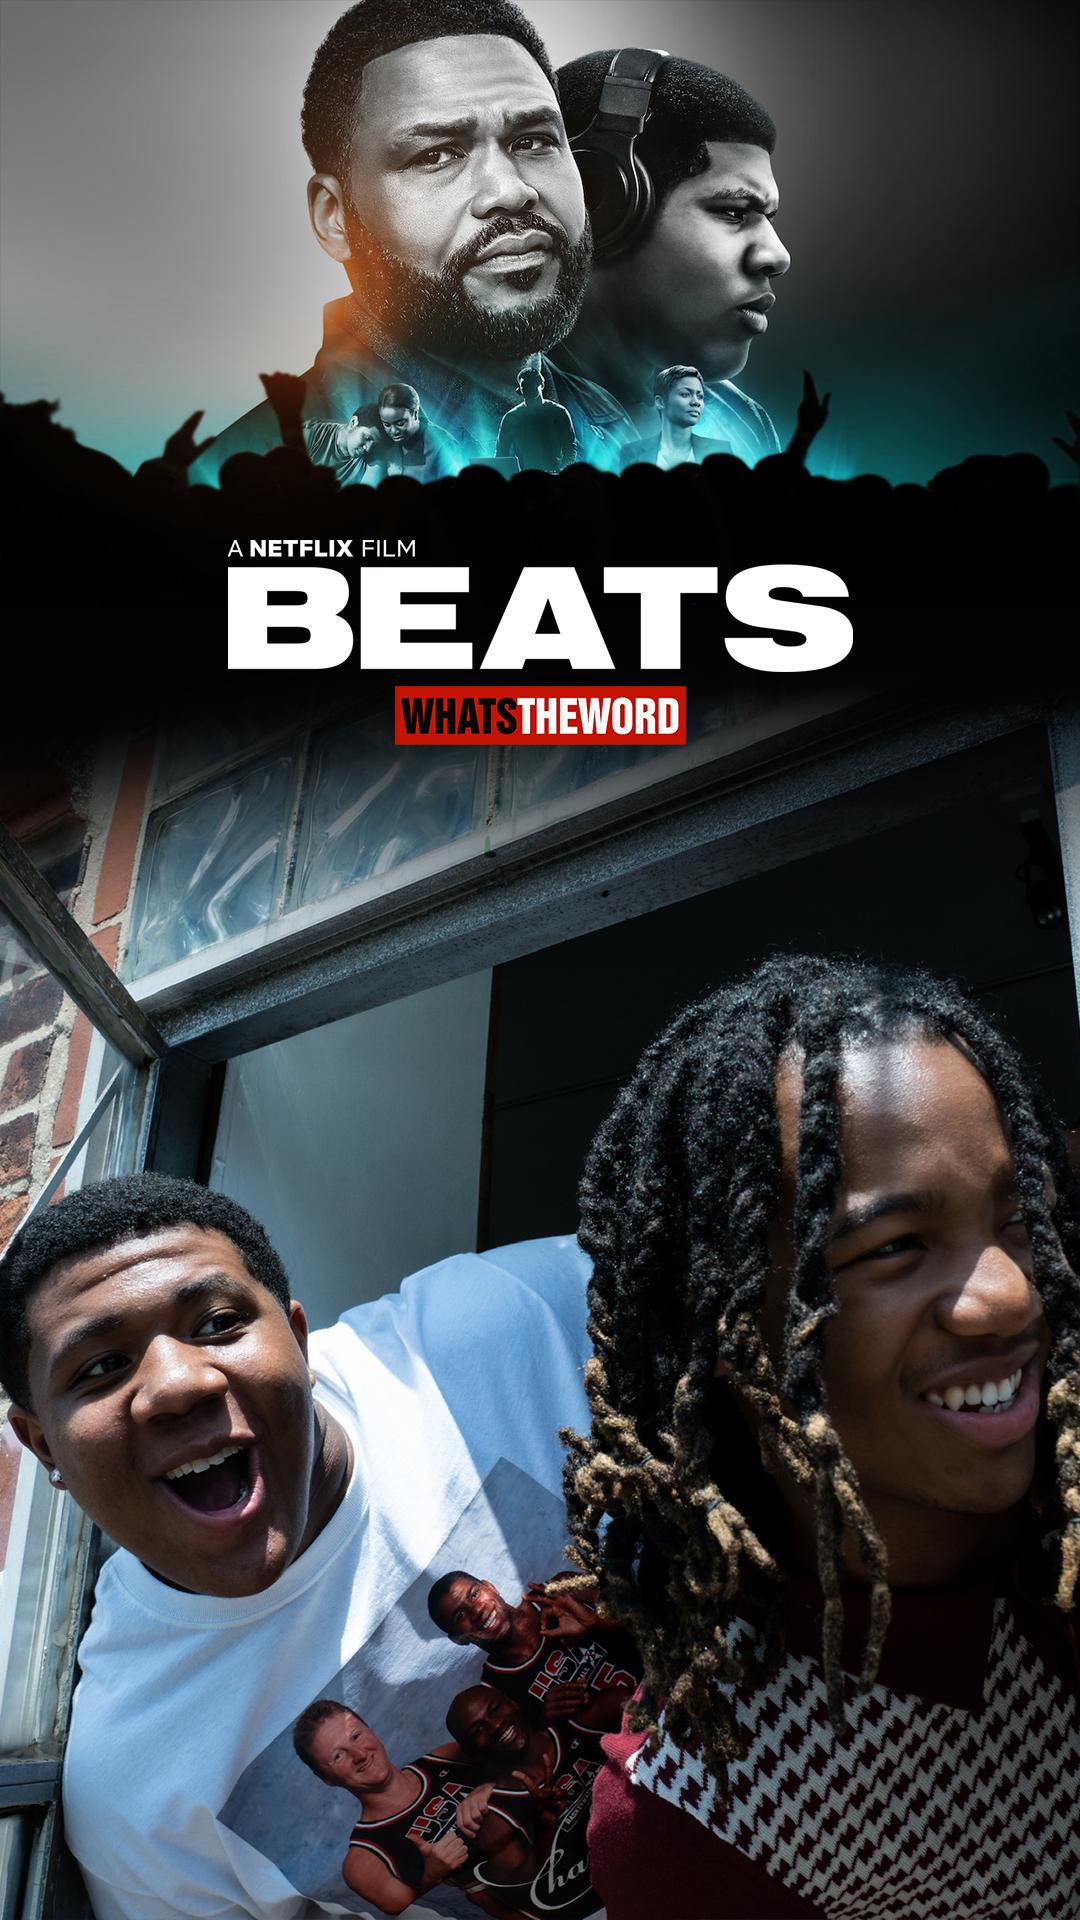 BEATS_IGTV COVER.jpg